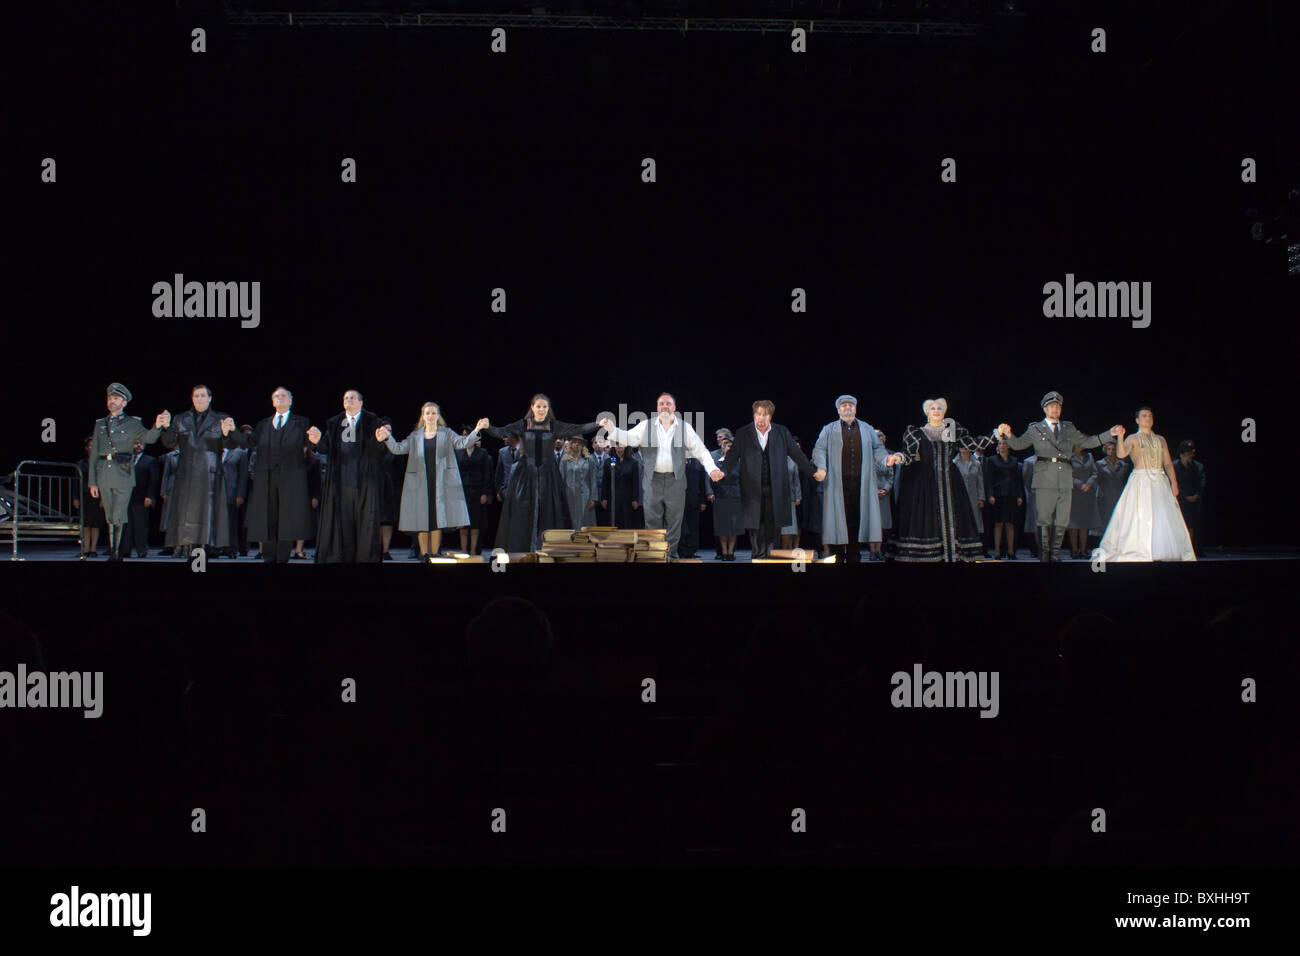 curtain call of cast of Mathis der Maler, Opera National de Paris, Bastille, Paris, France - Stock Image